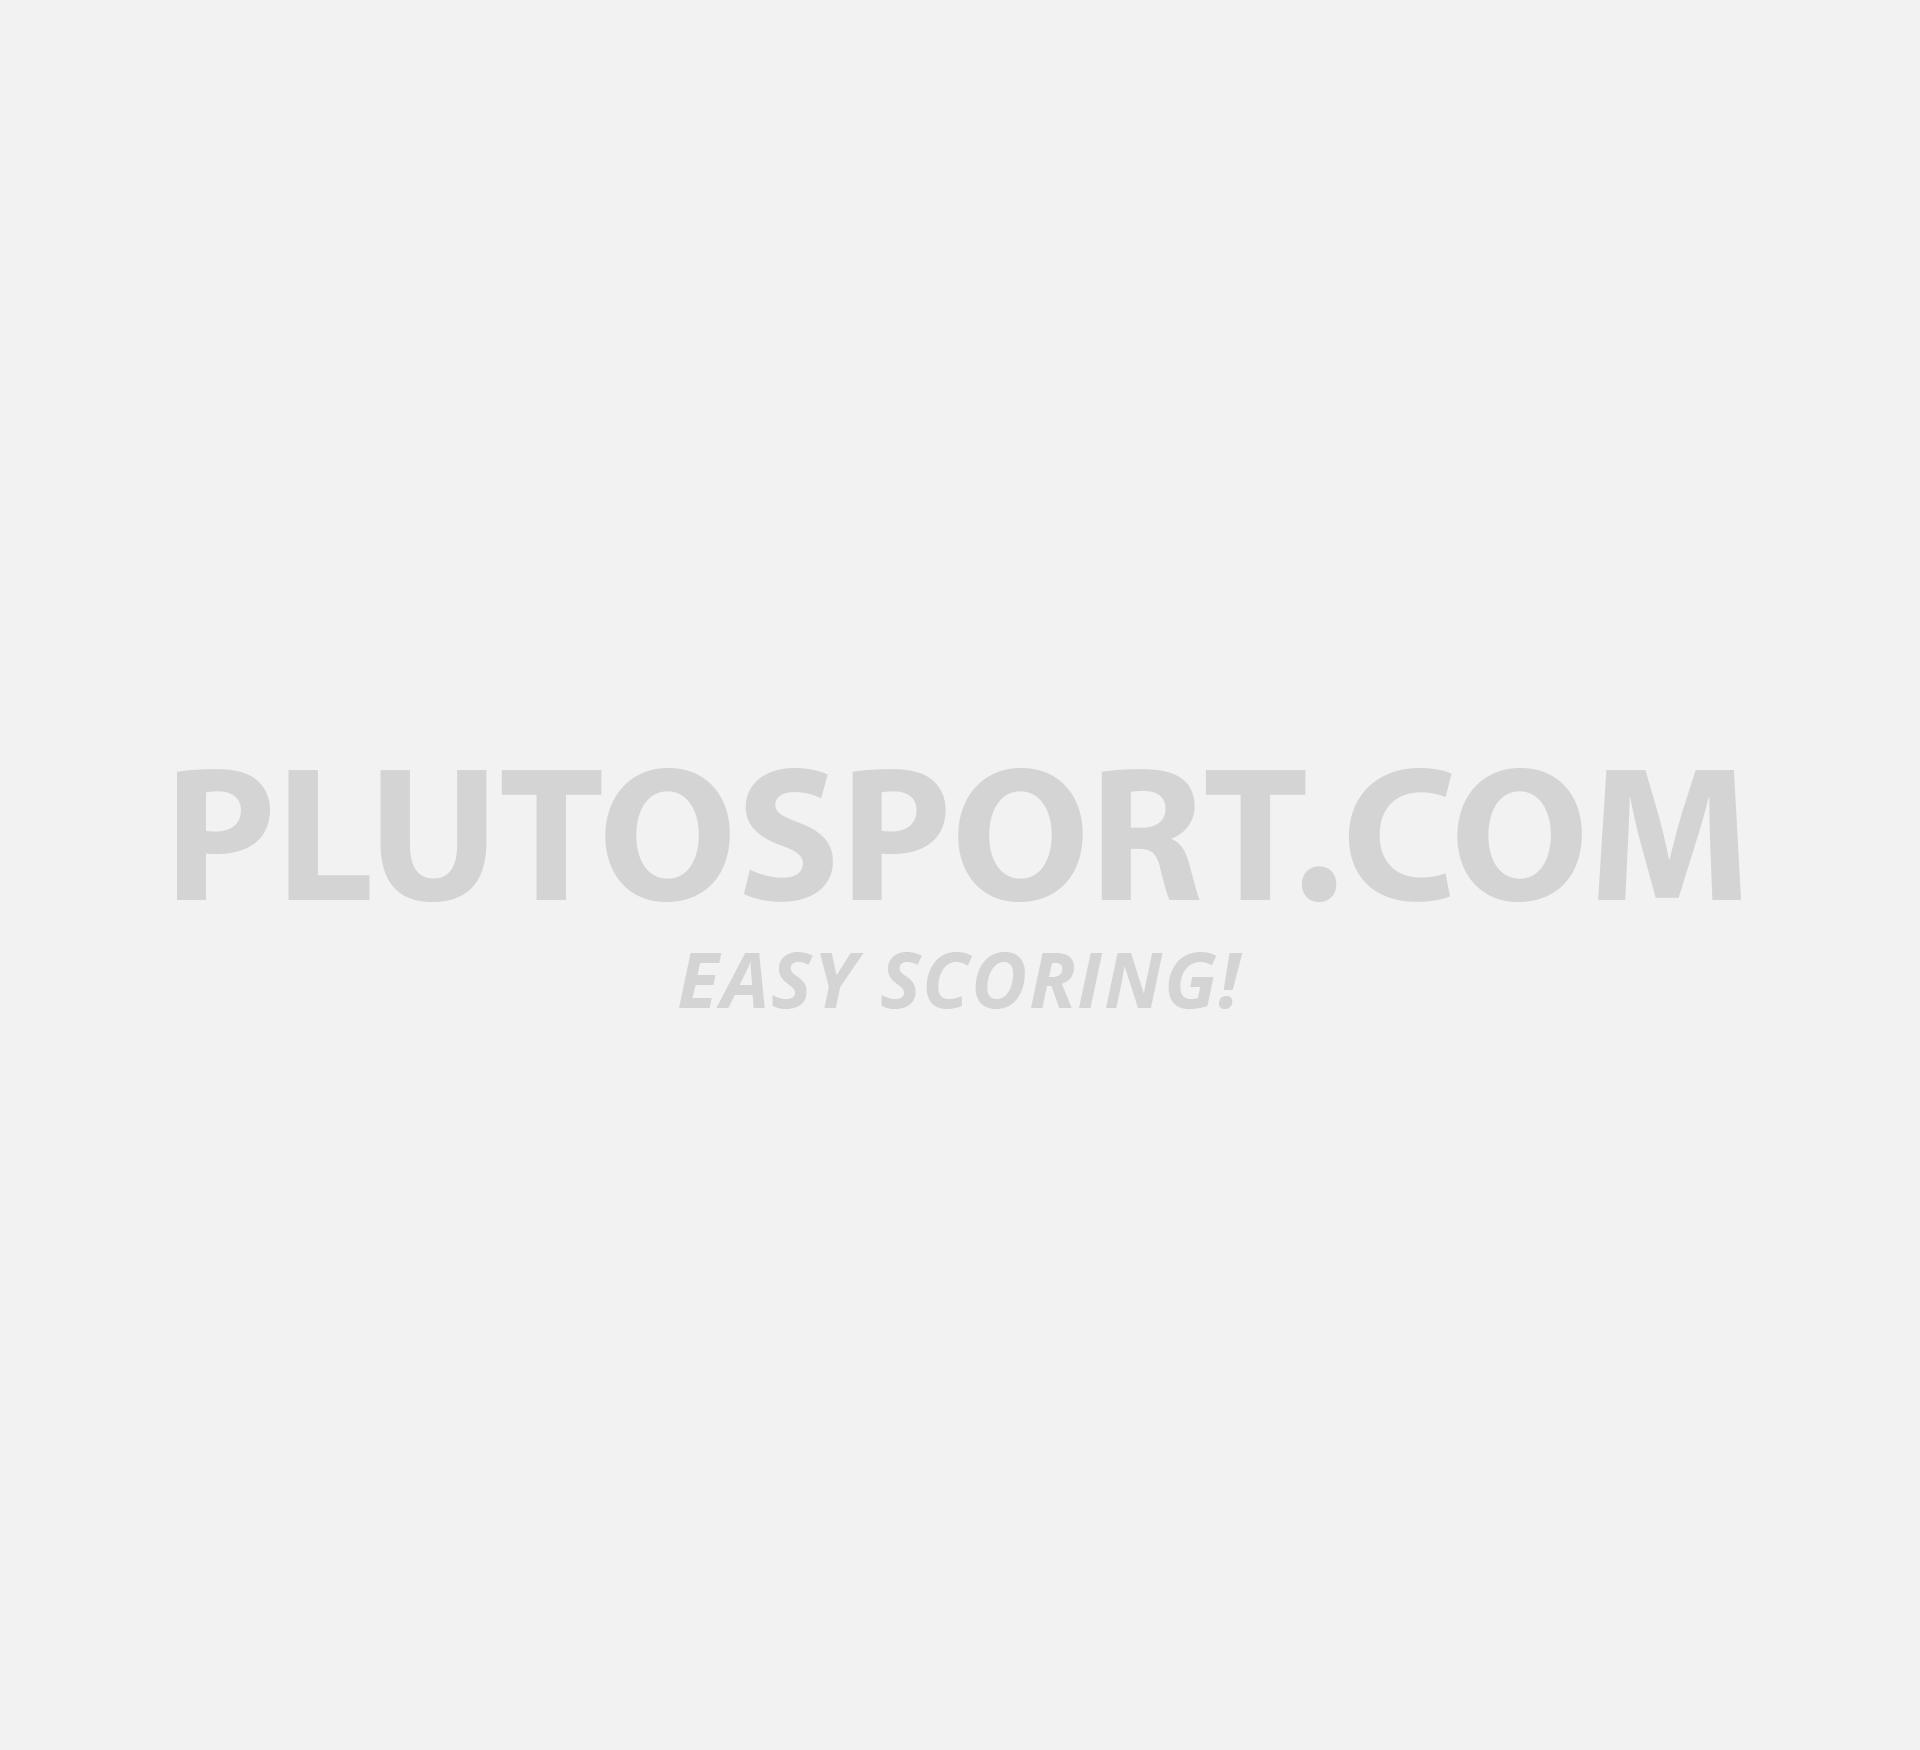 Adidas Adizero Mana  Running Shoes Review